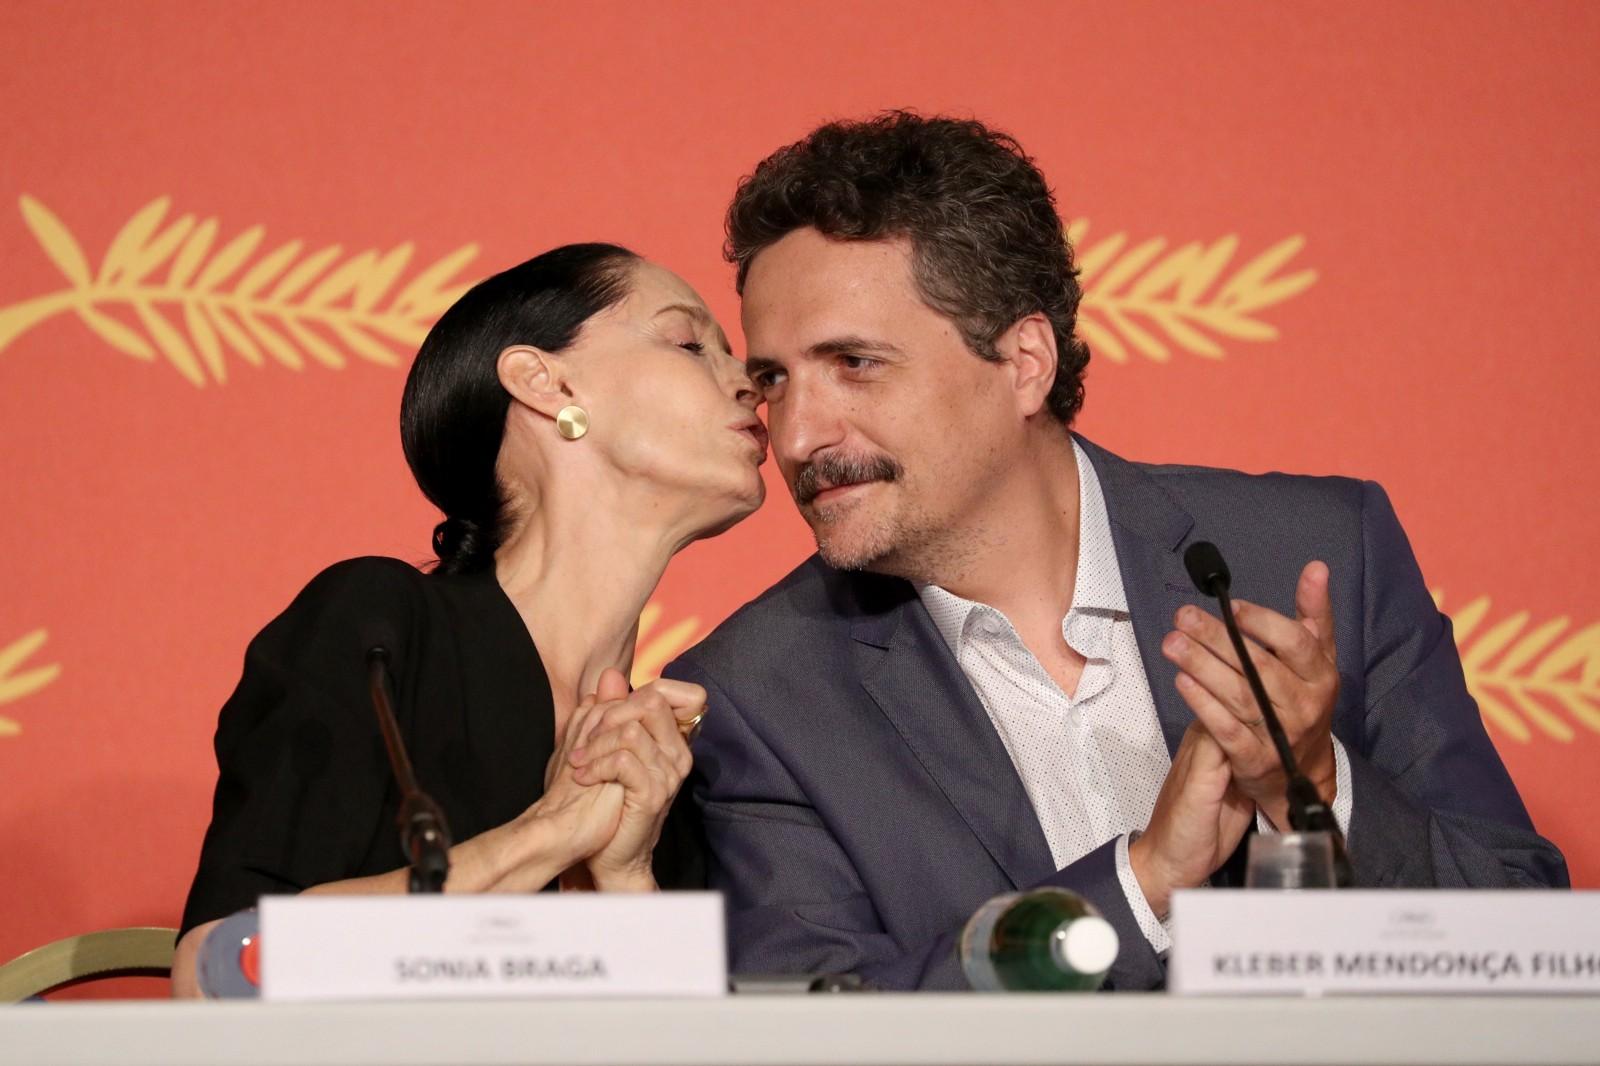 Actress Sônia Braga with director Kleber Mendonça Filho at the 2016 Cannes Film Festival